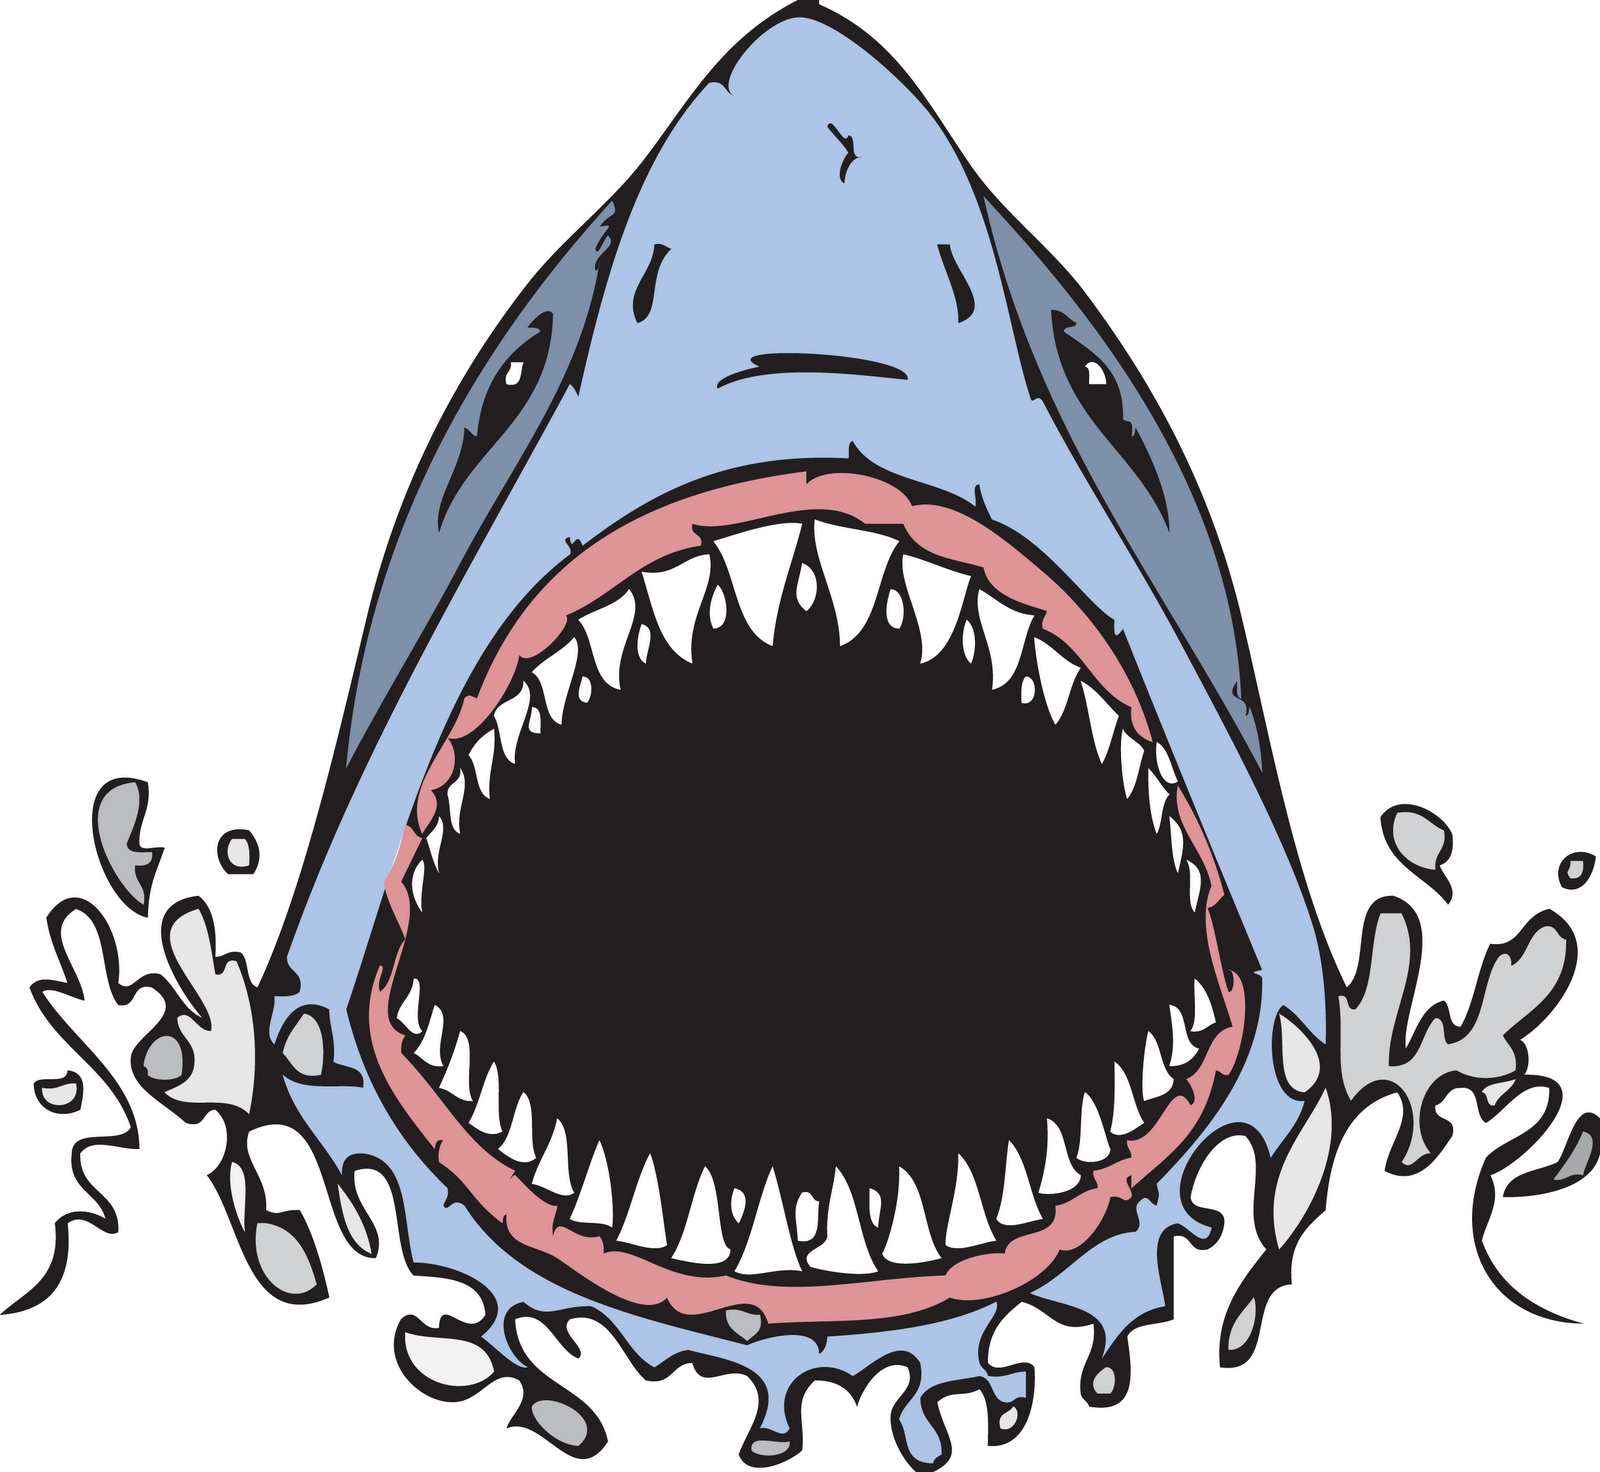 Hammerhead clipart open shark mouth Mouth shark 10:39 jaws Kid